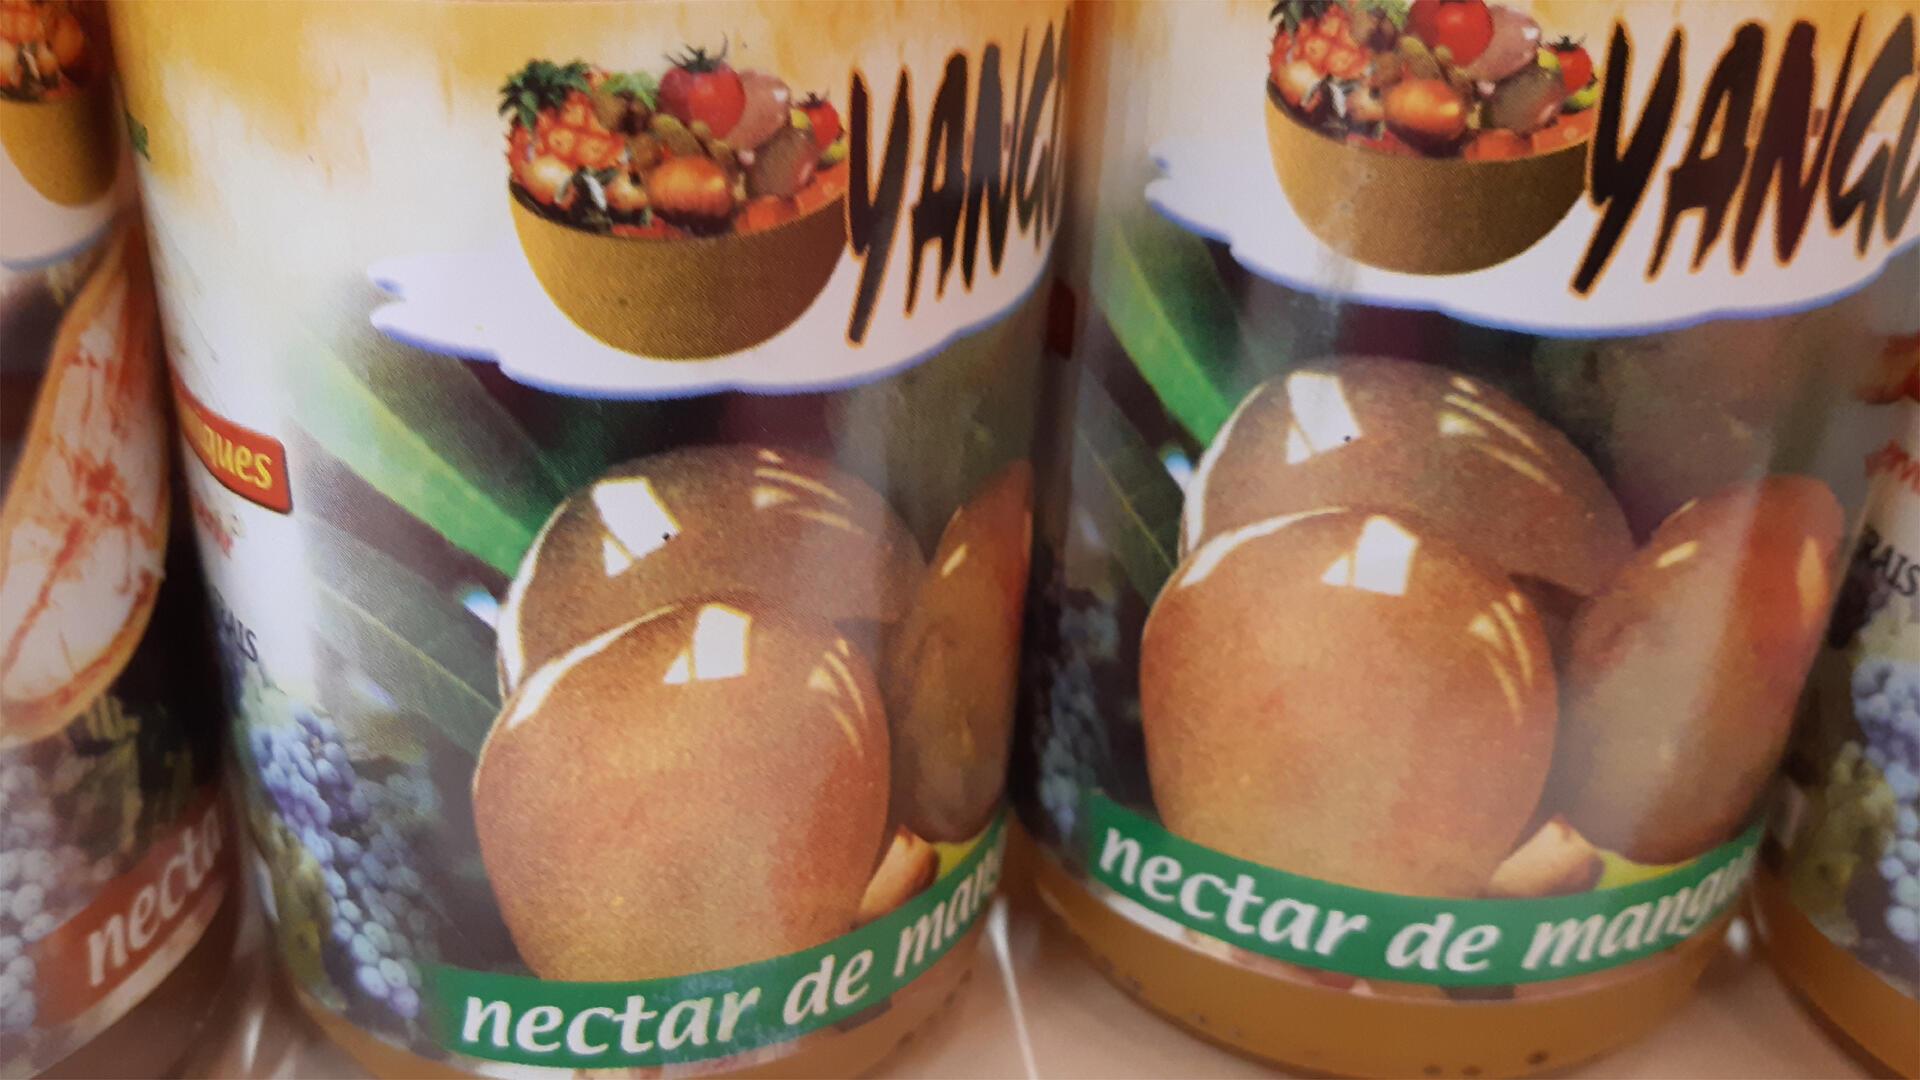 Nectar de mangues.